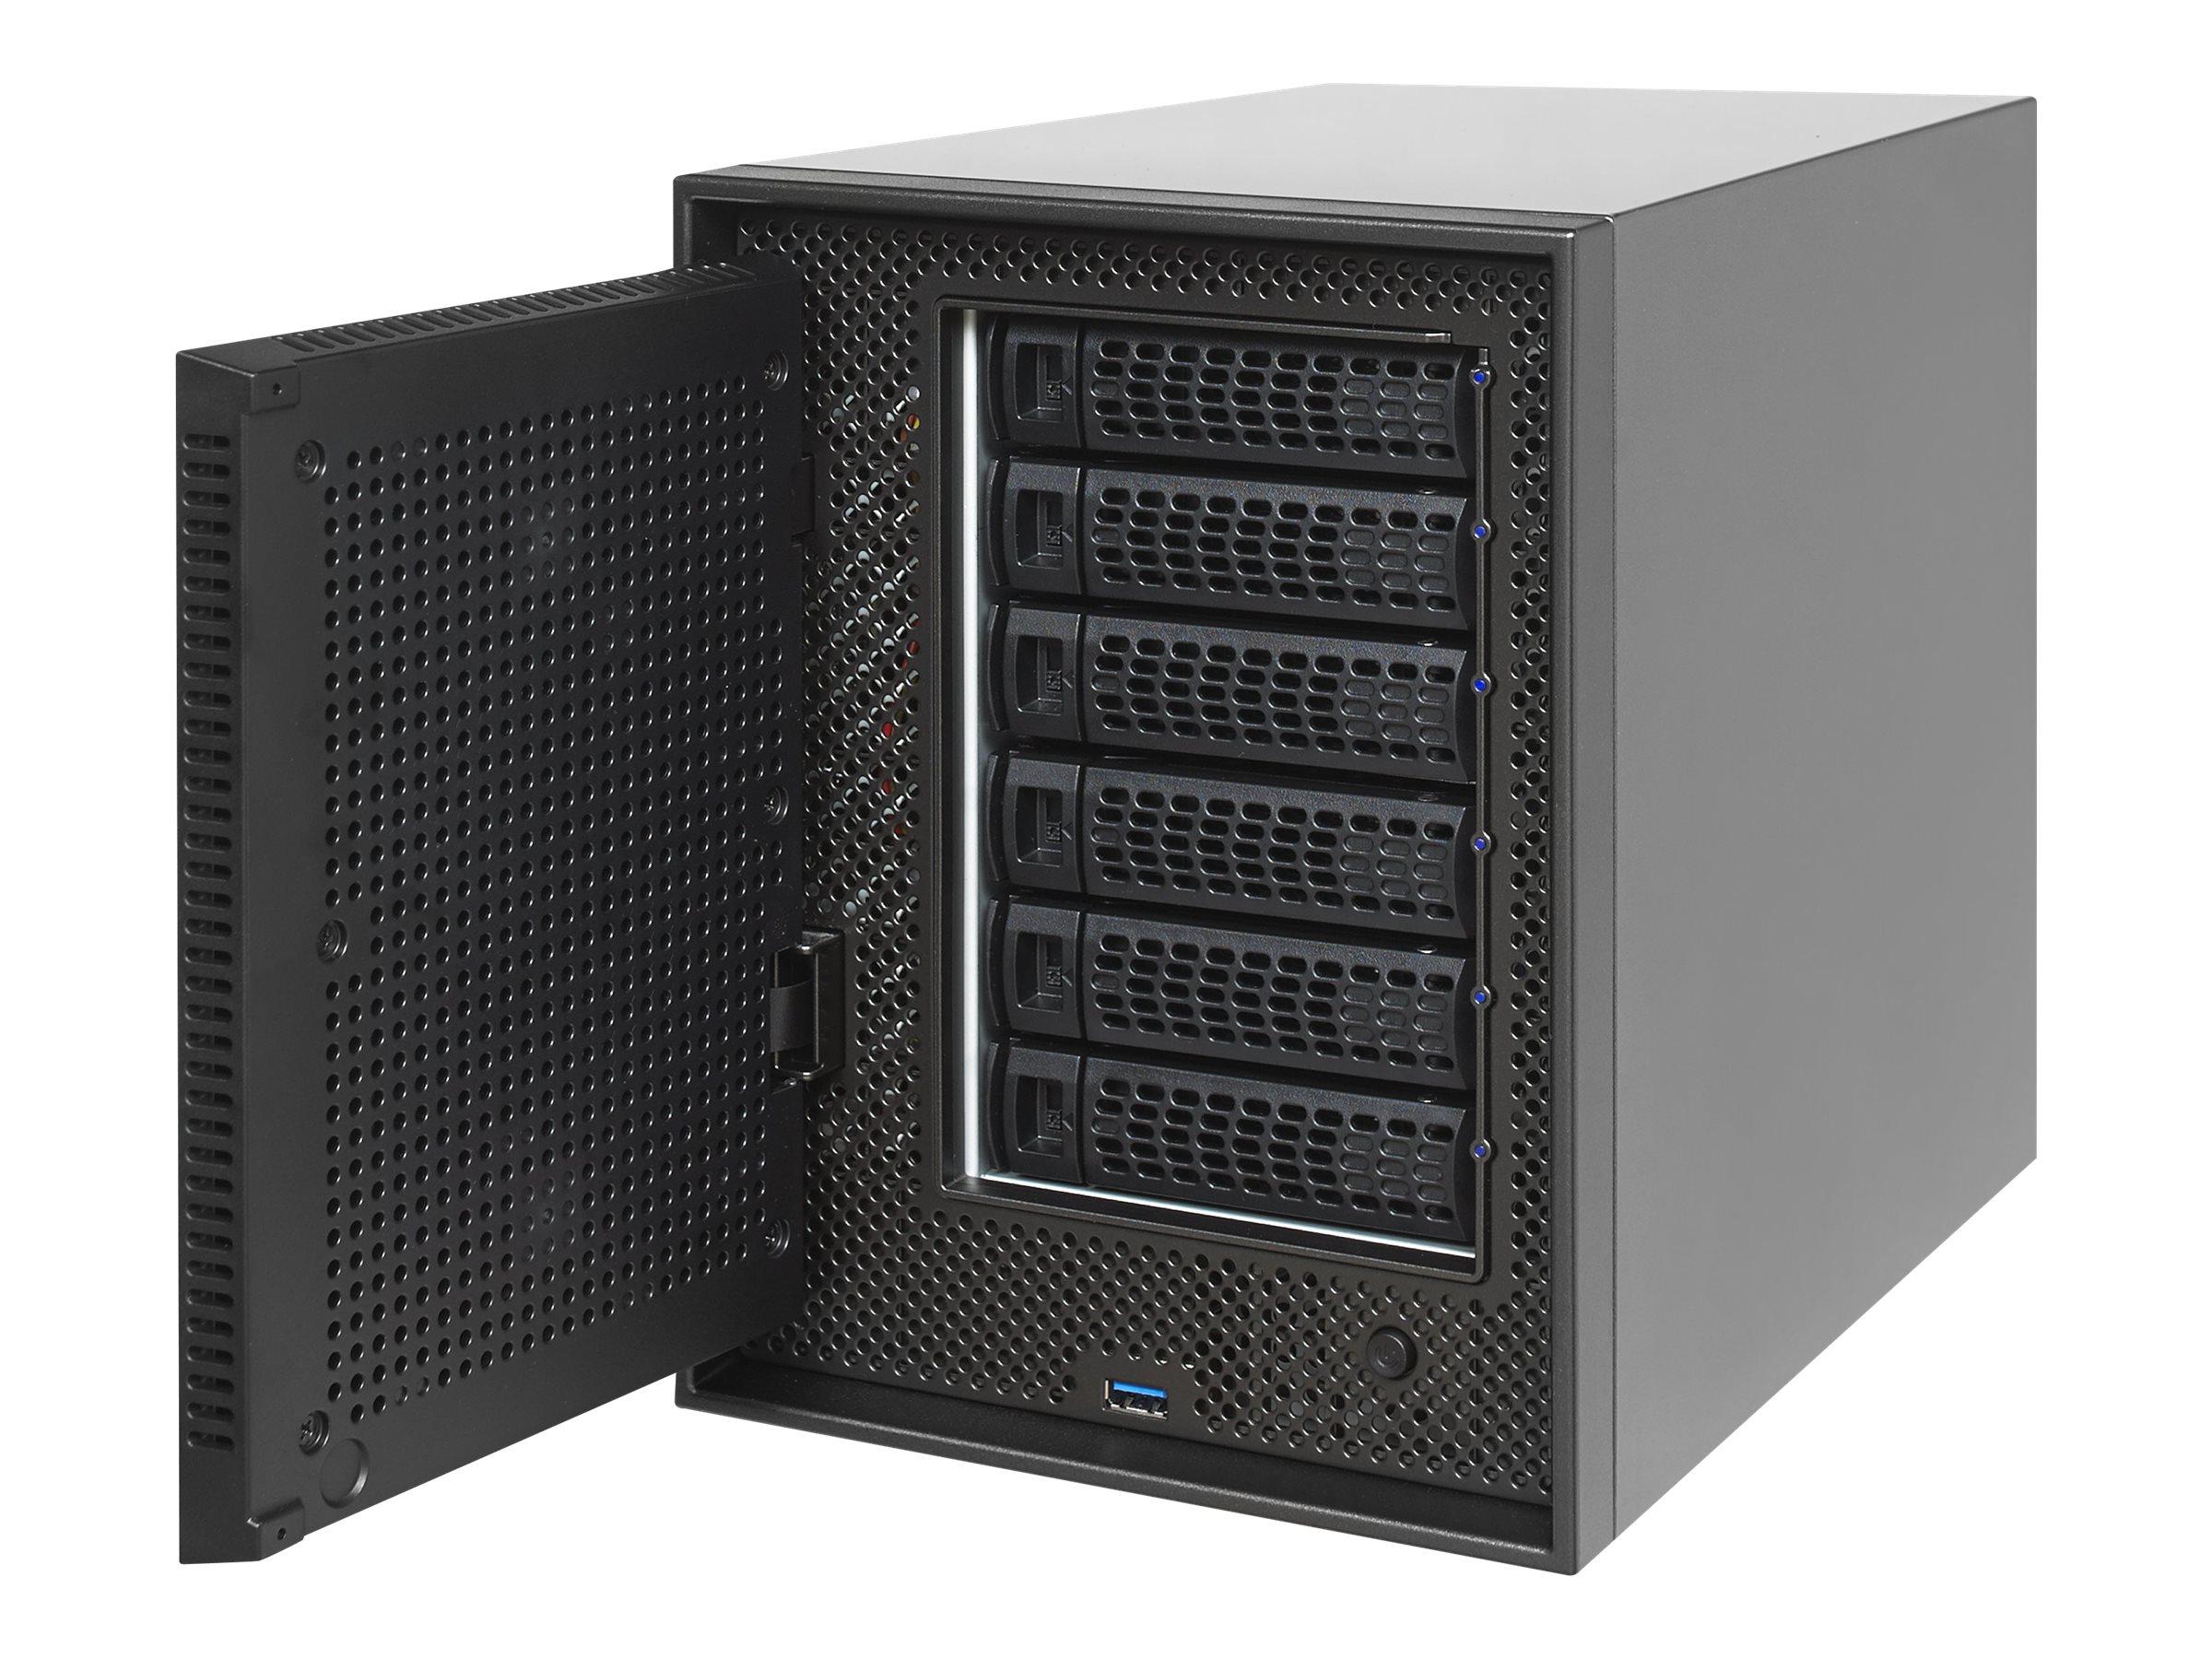 Netgear ReadyNAS 526X - NAS-Server - 6 Sch?chte